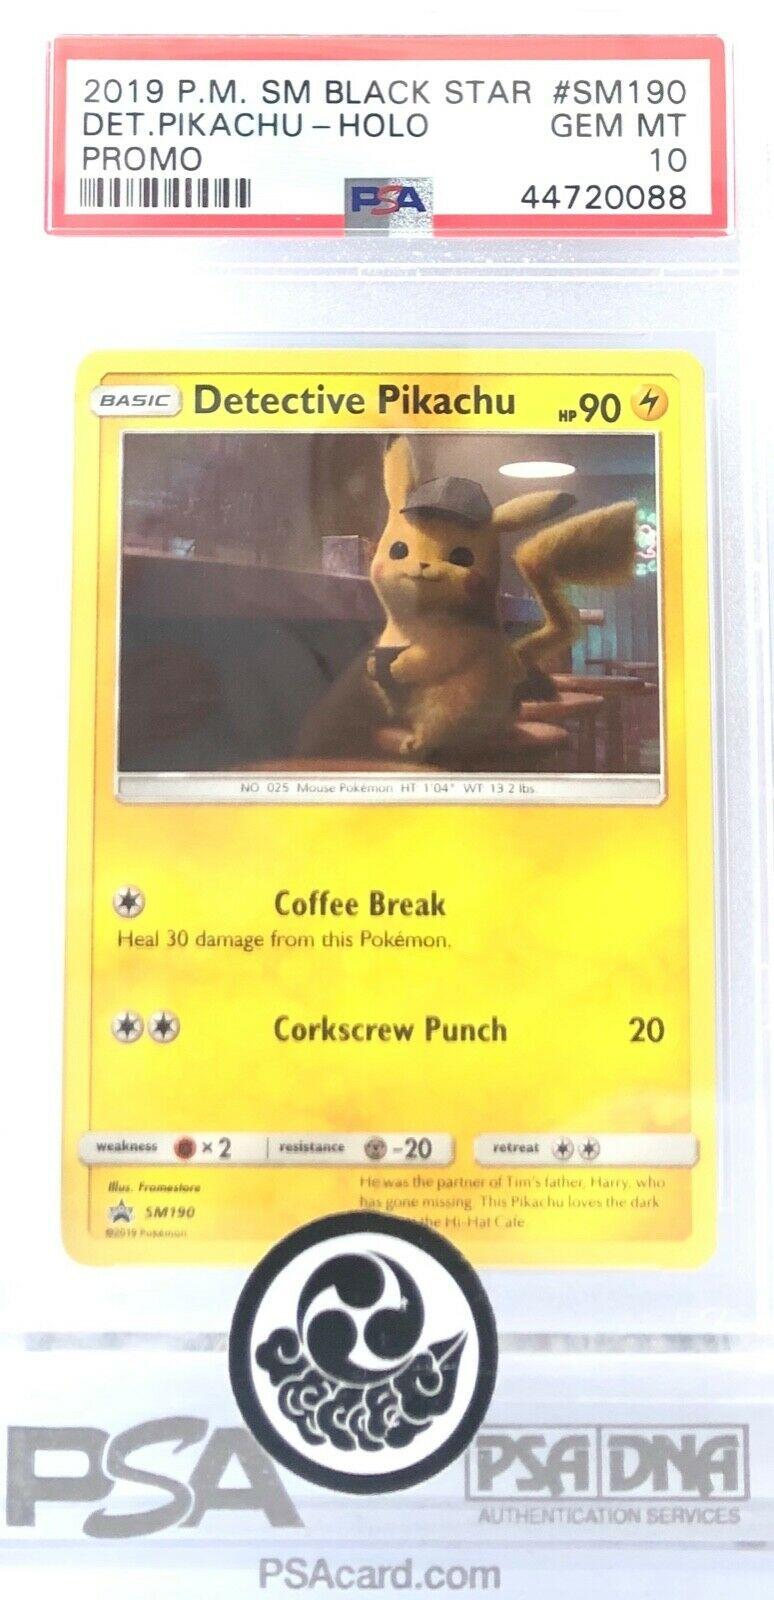 2019 Pokémon TCG S /& M Black Star Promo #SM190 Detective Pikachu Holo PSA 10 GEM